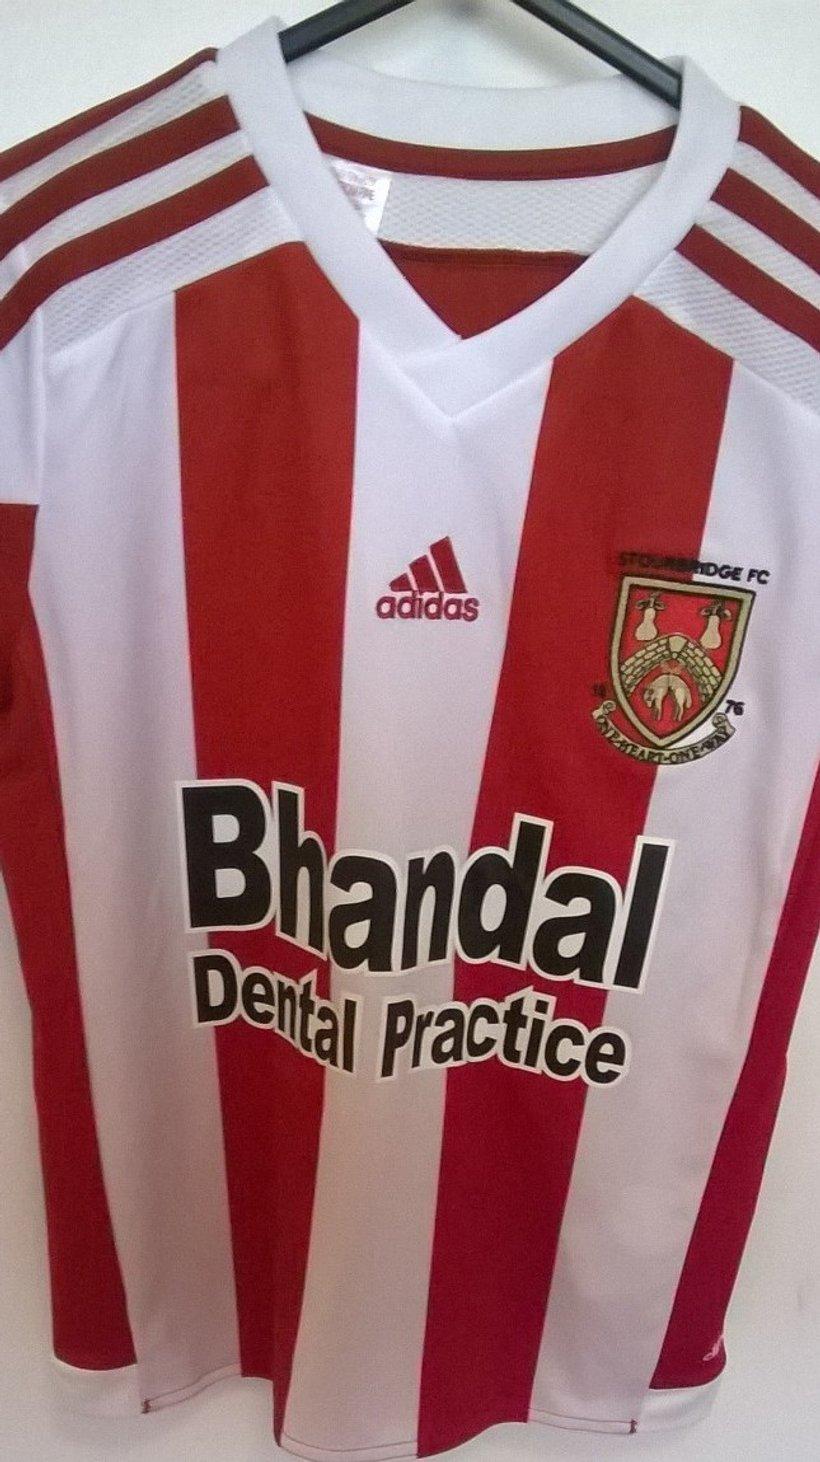 Club Shop  Home Replica Shirts update - News - Stourbridge FC 847539ae9